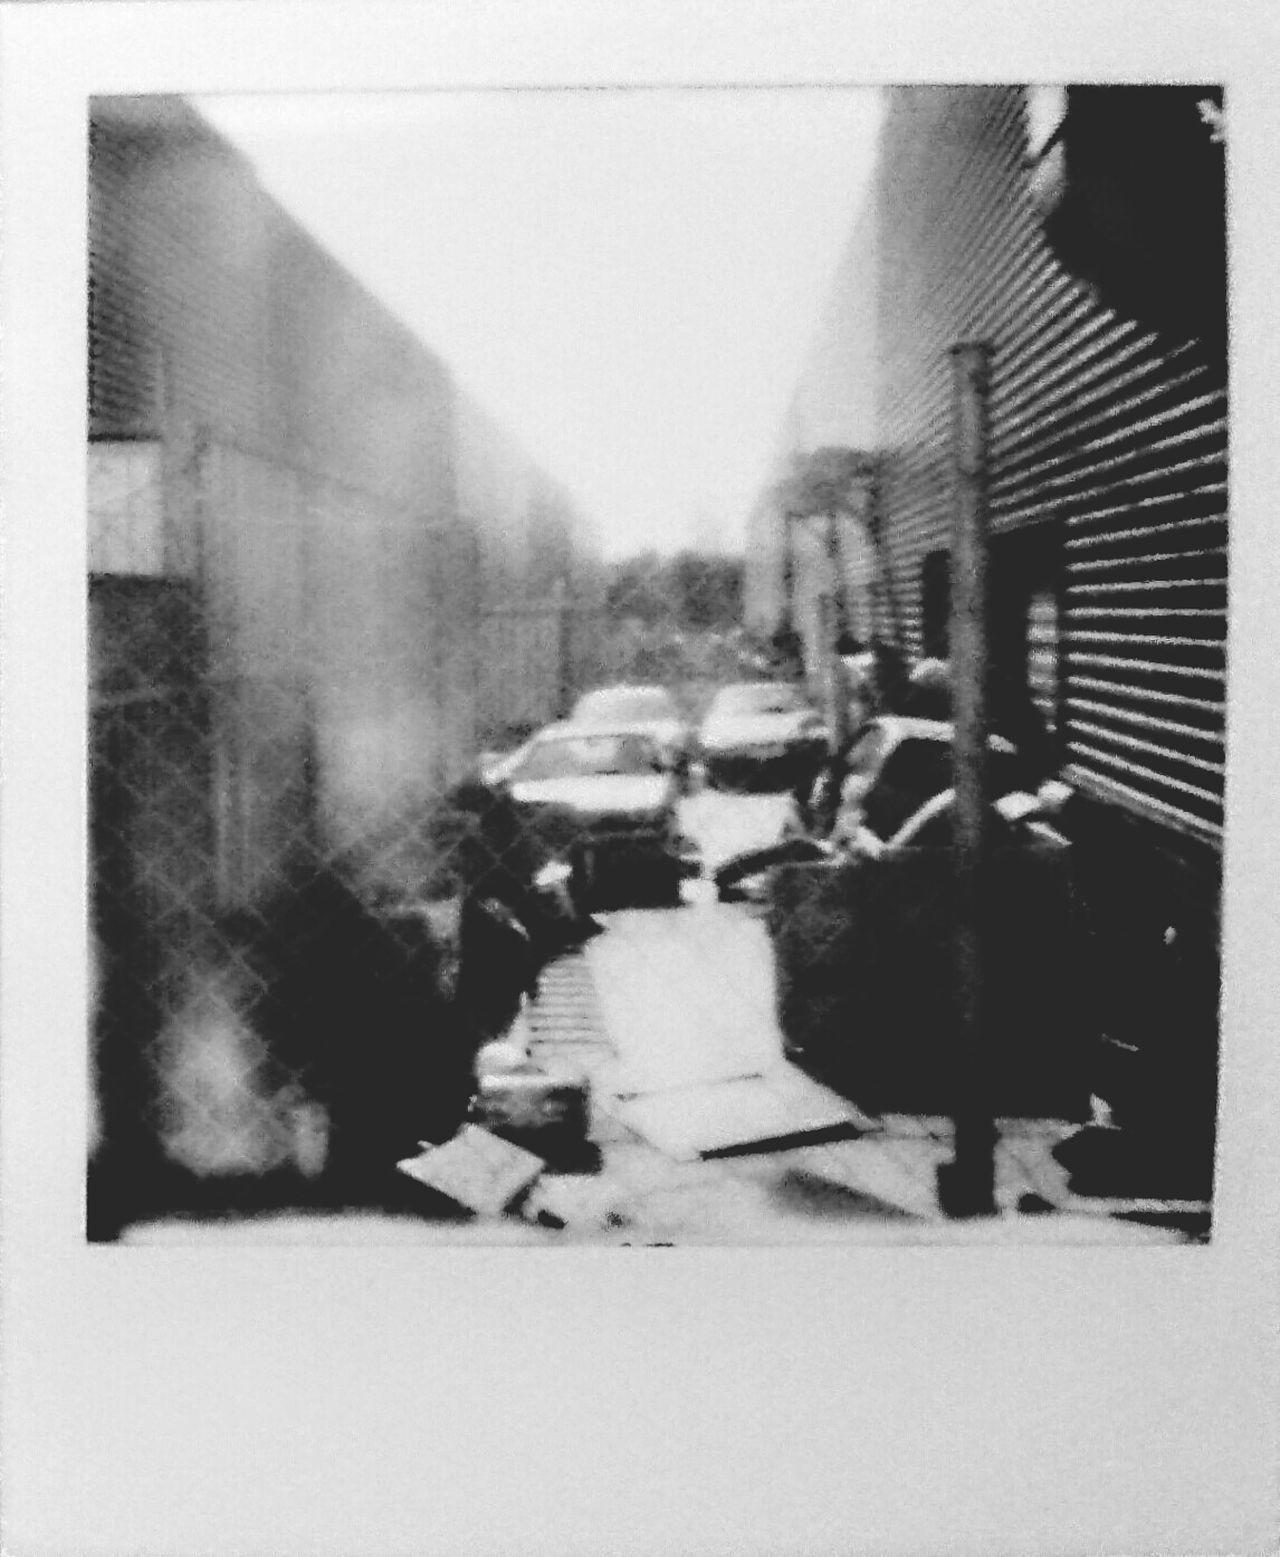 instant photo Blackandwhite Polaroid Photography Streetphotography Realpolaroid Outdoors No People MyArt